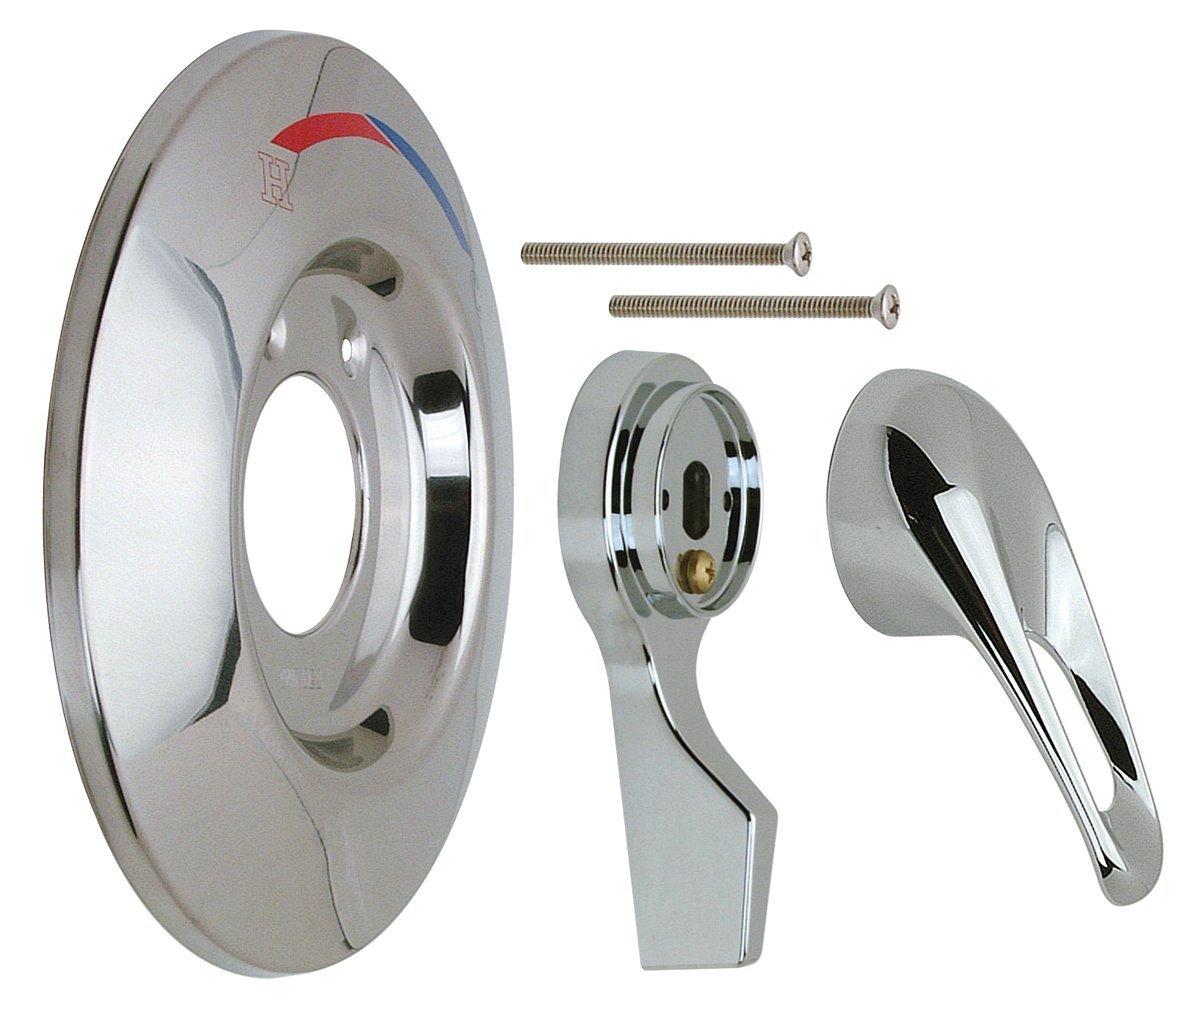 BrassCraft Mfg Mixet #MTR-9 HH Single Handle Tub and Shower Trim Kit - Chrome